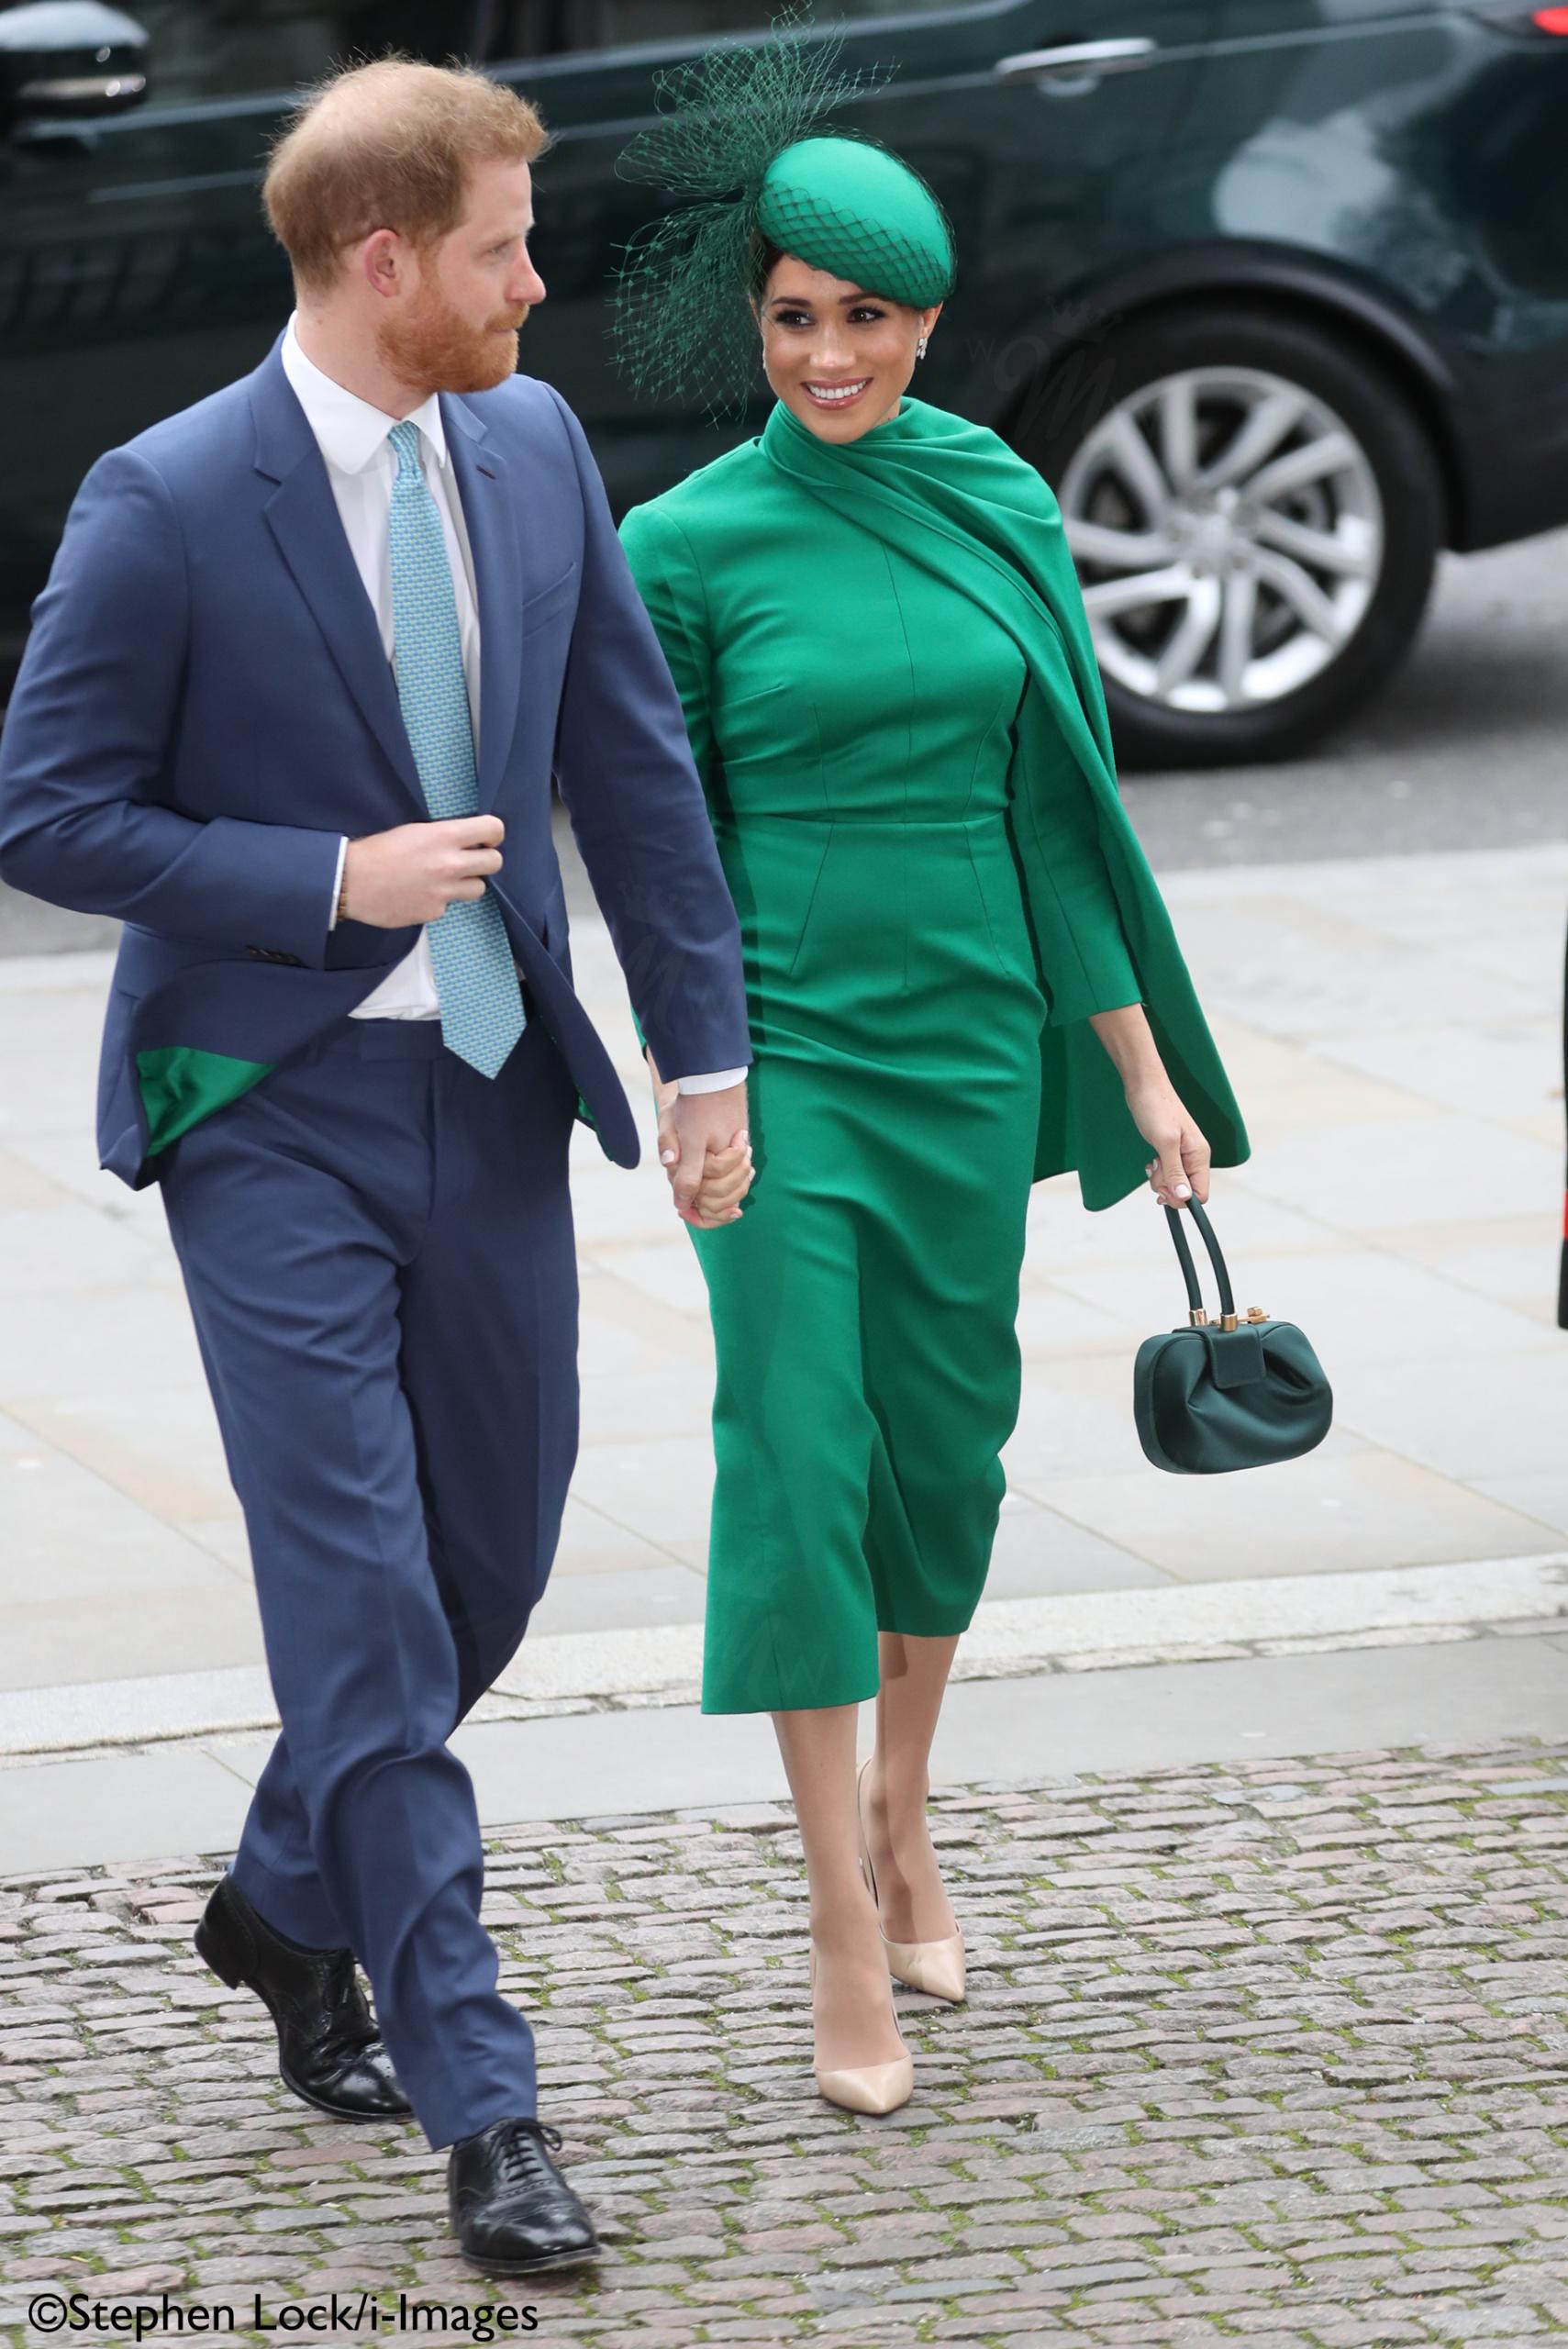 meghan in emerald green emilia wickstead for commonwealth service meghan in emerald green emilia wickstead for commonwealth service